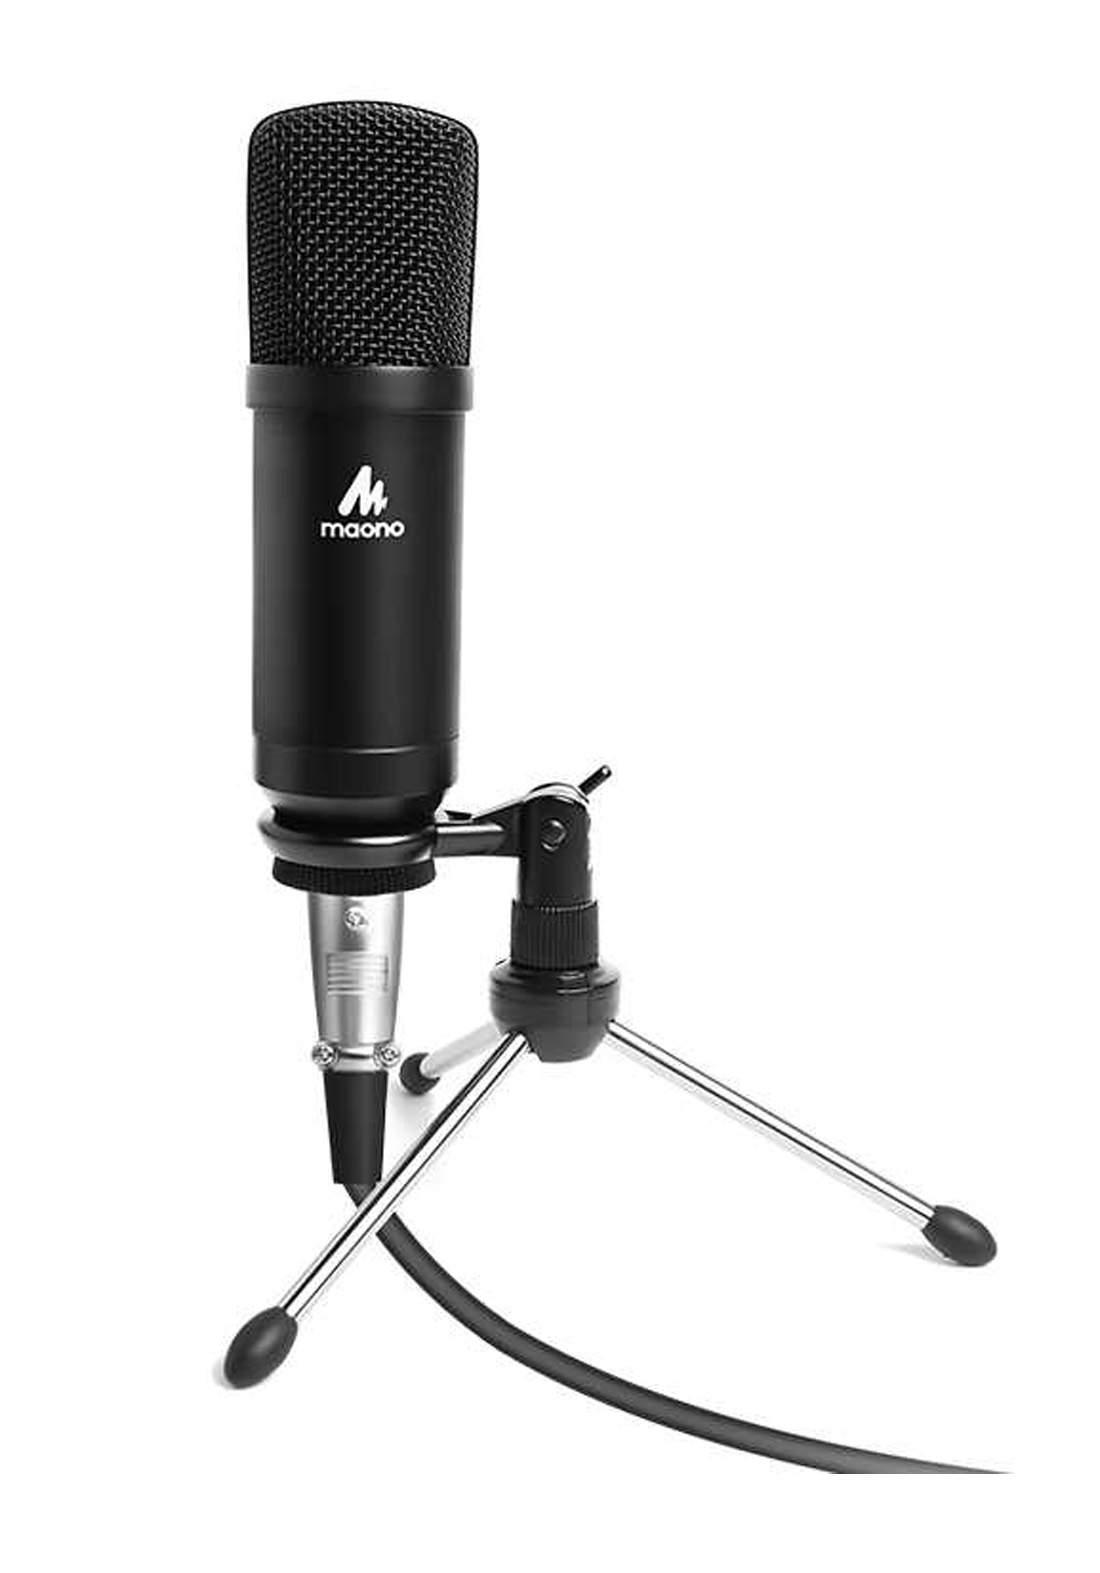 Maono AU-A03TR JACK 3.5MM XLR Wired Microphone - Black مايكروفون